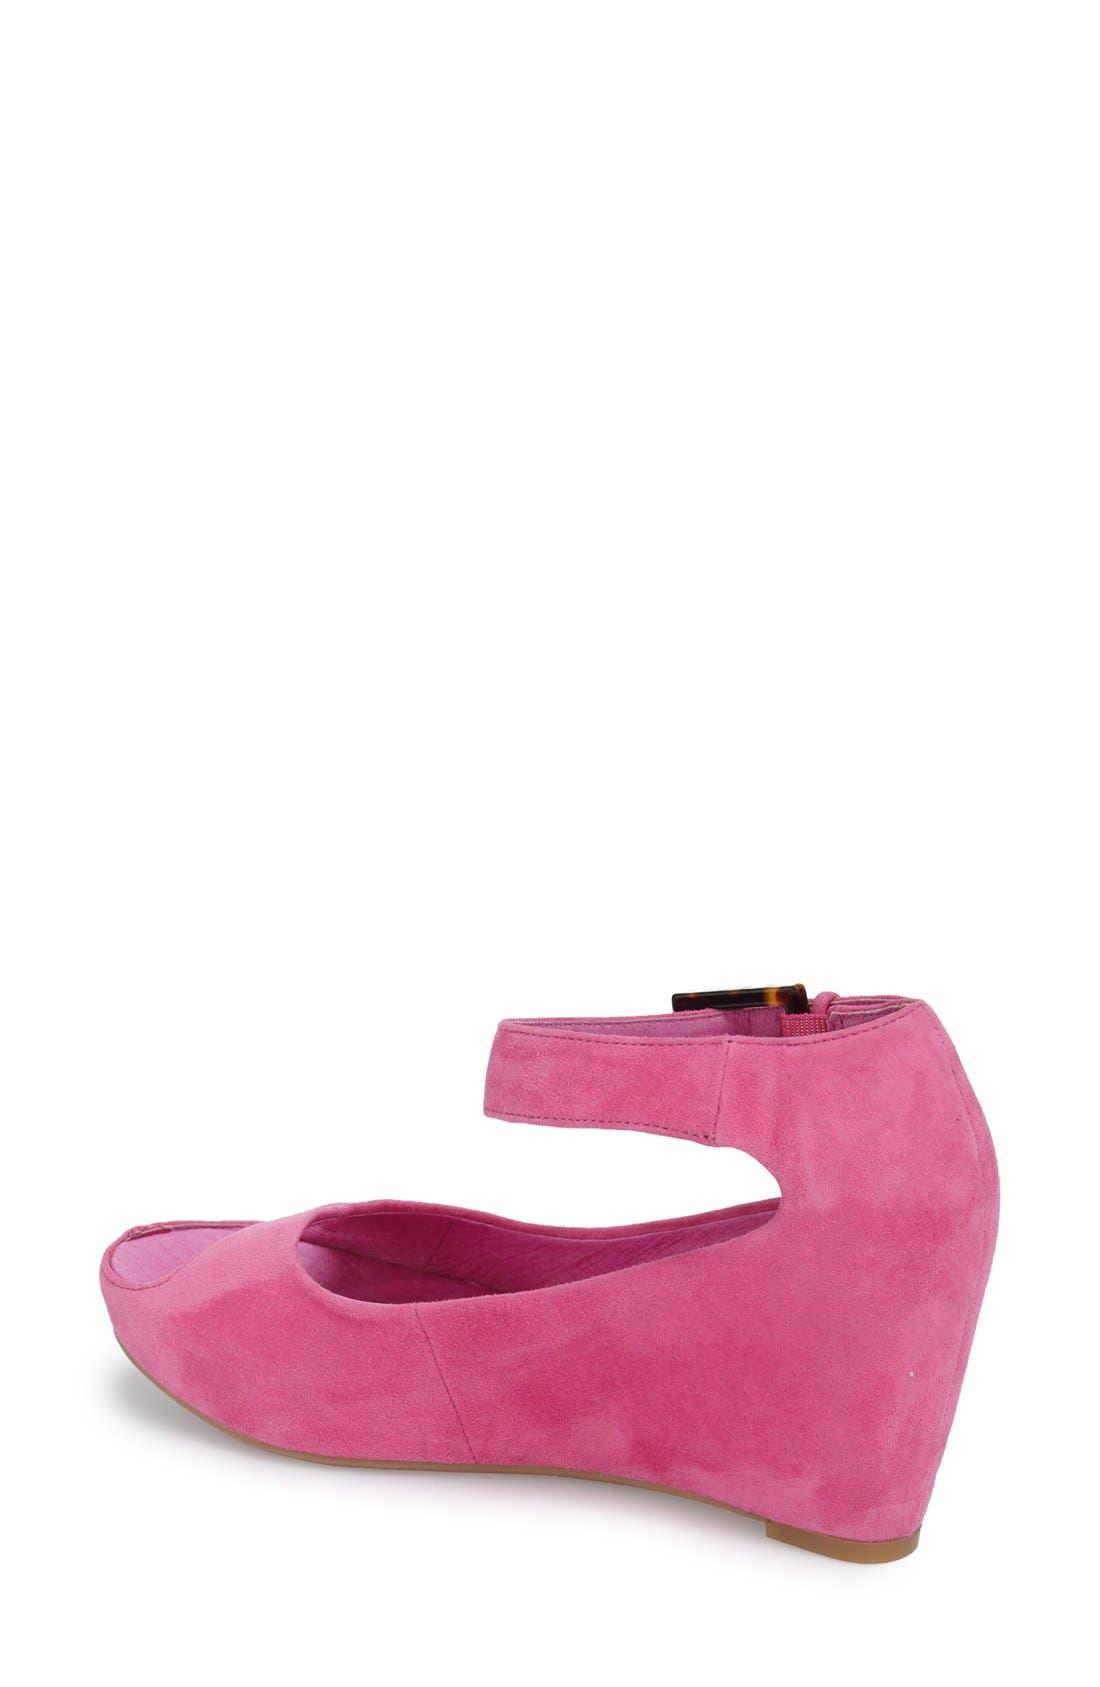 'Tricia' Ankle Strap Sandal,                             Alternate thumbnail 61, color,